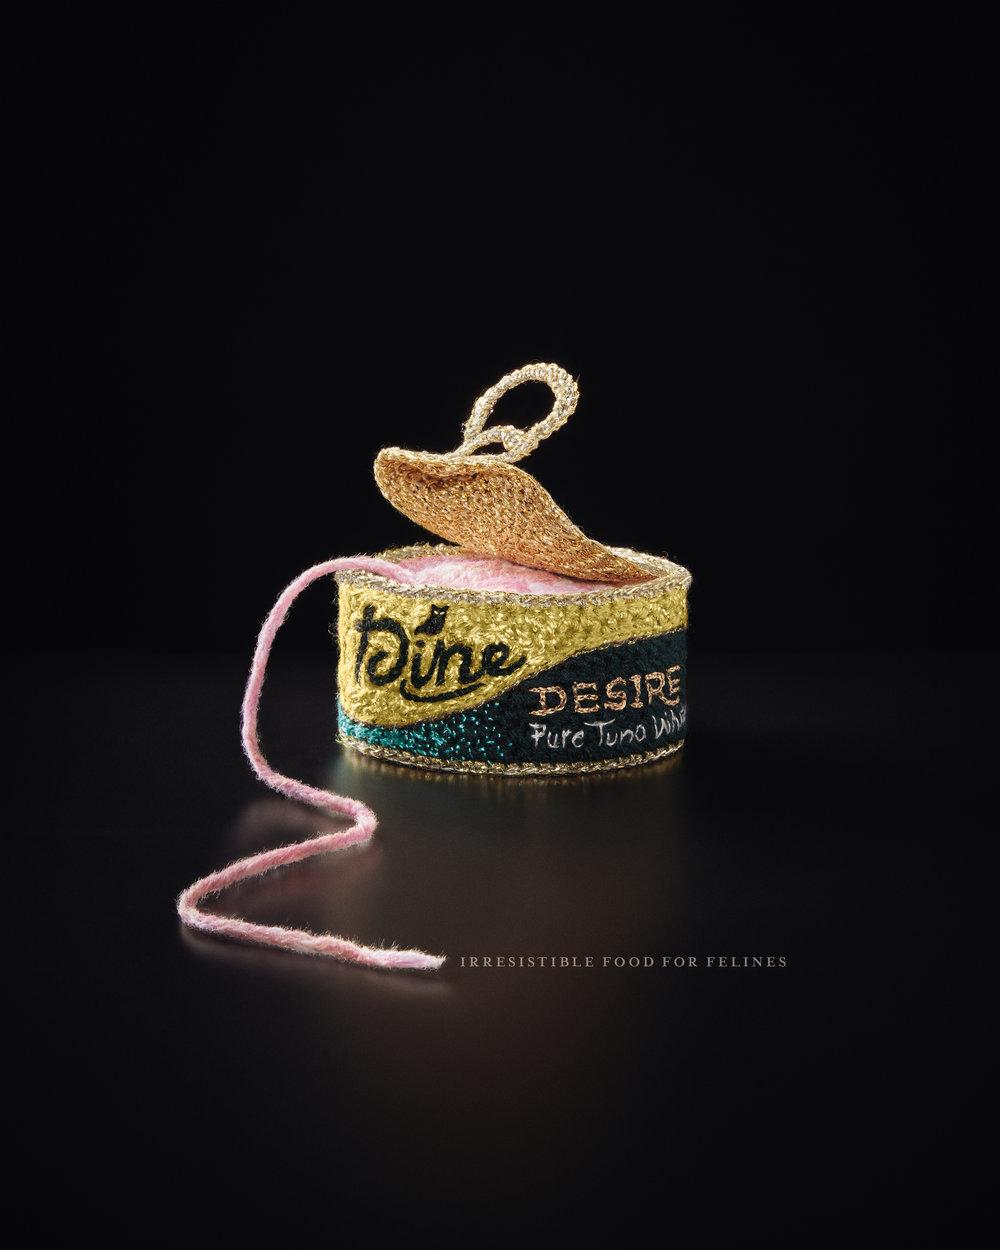 Dine_Irresistible+Packshots_The+Yarn+Can_rgb.jpg